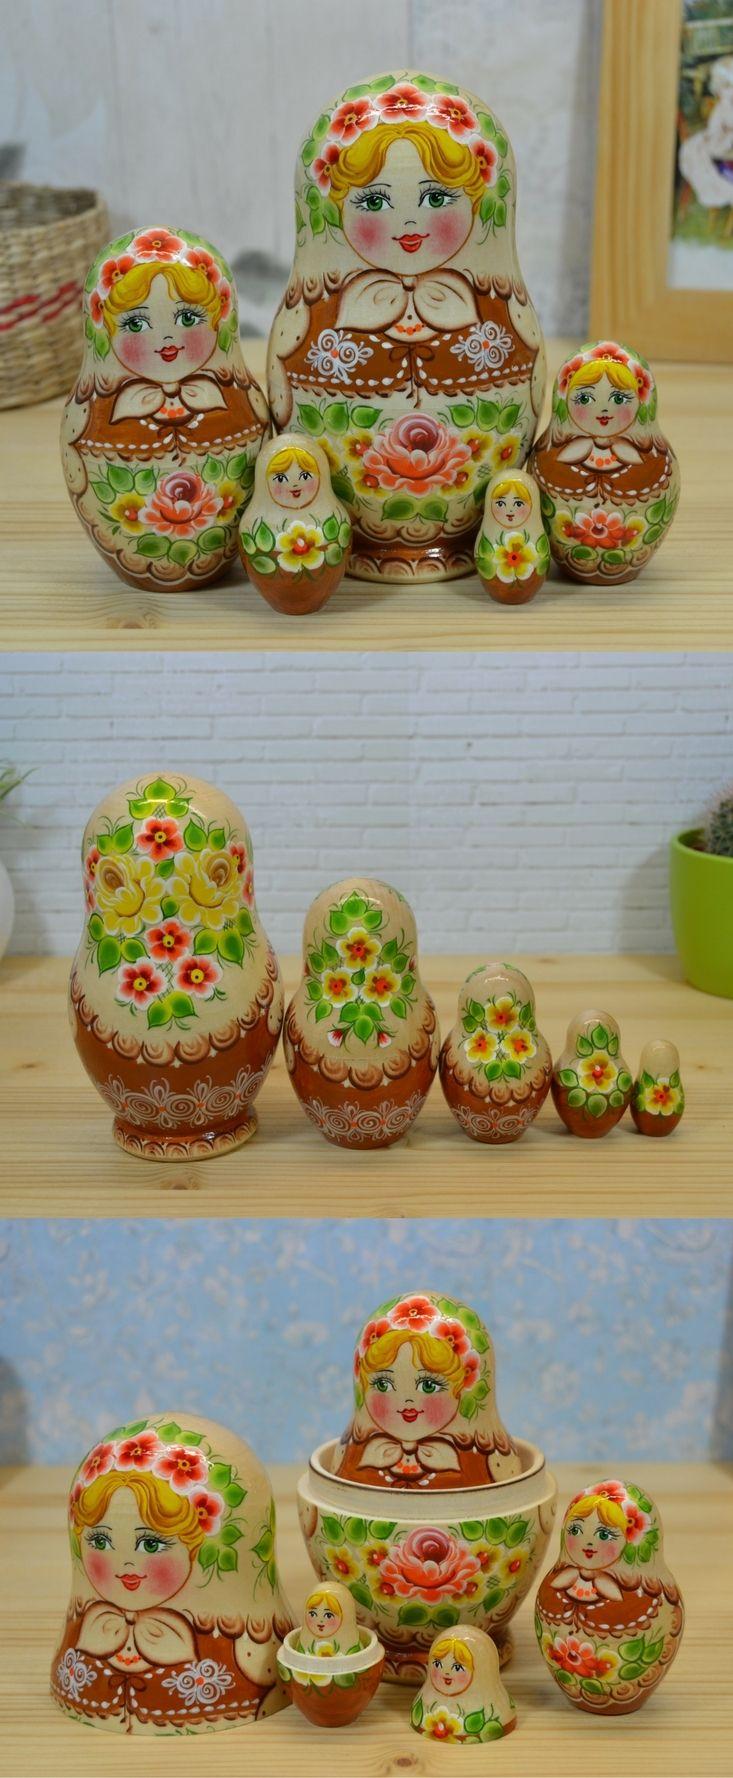 the 25 best russian babushka ideas on pinterest russian culture